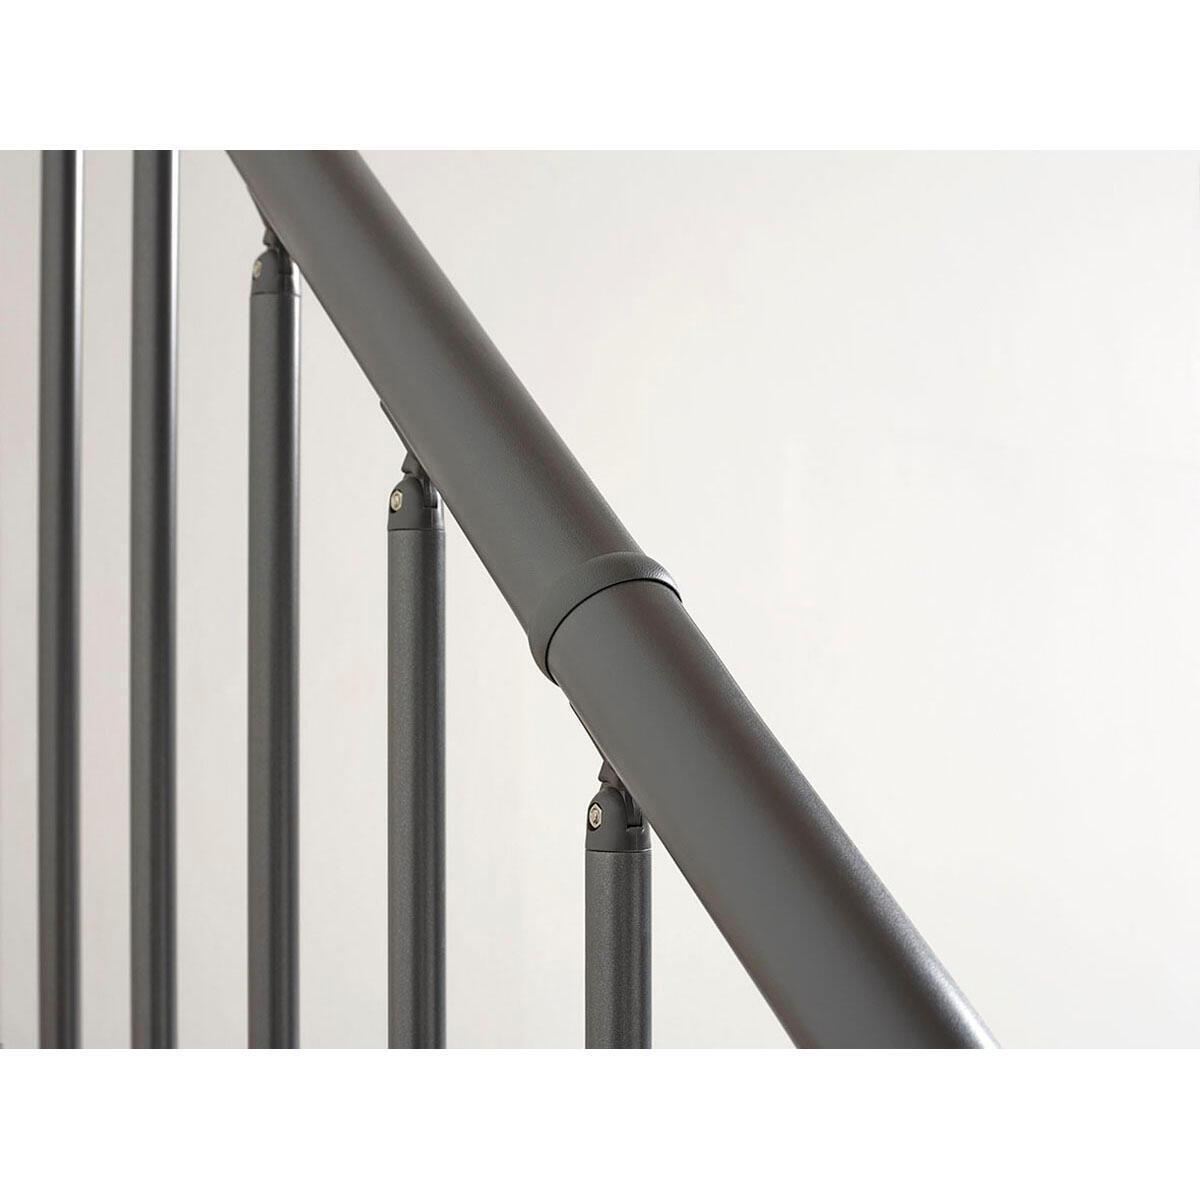 Scala a rampa 1/4 di giro OAK90 FONTANOT L 80 cm, gradino naturale, struttura antracite - 8